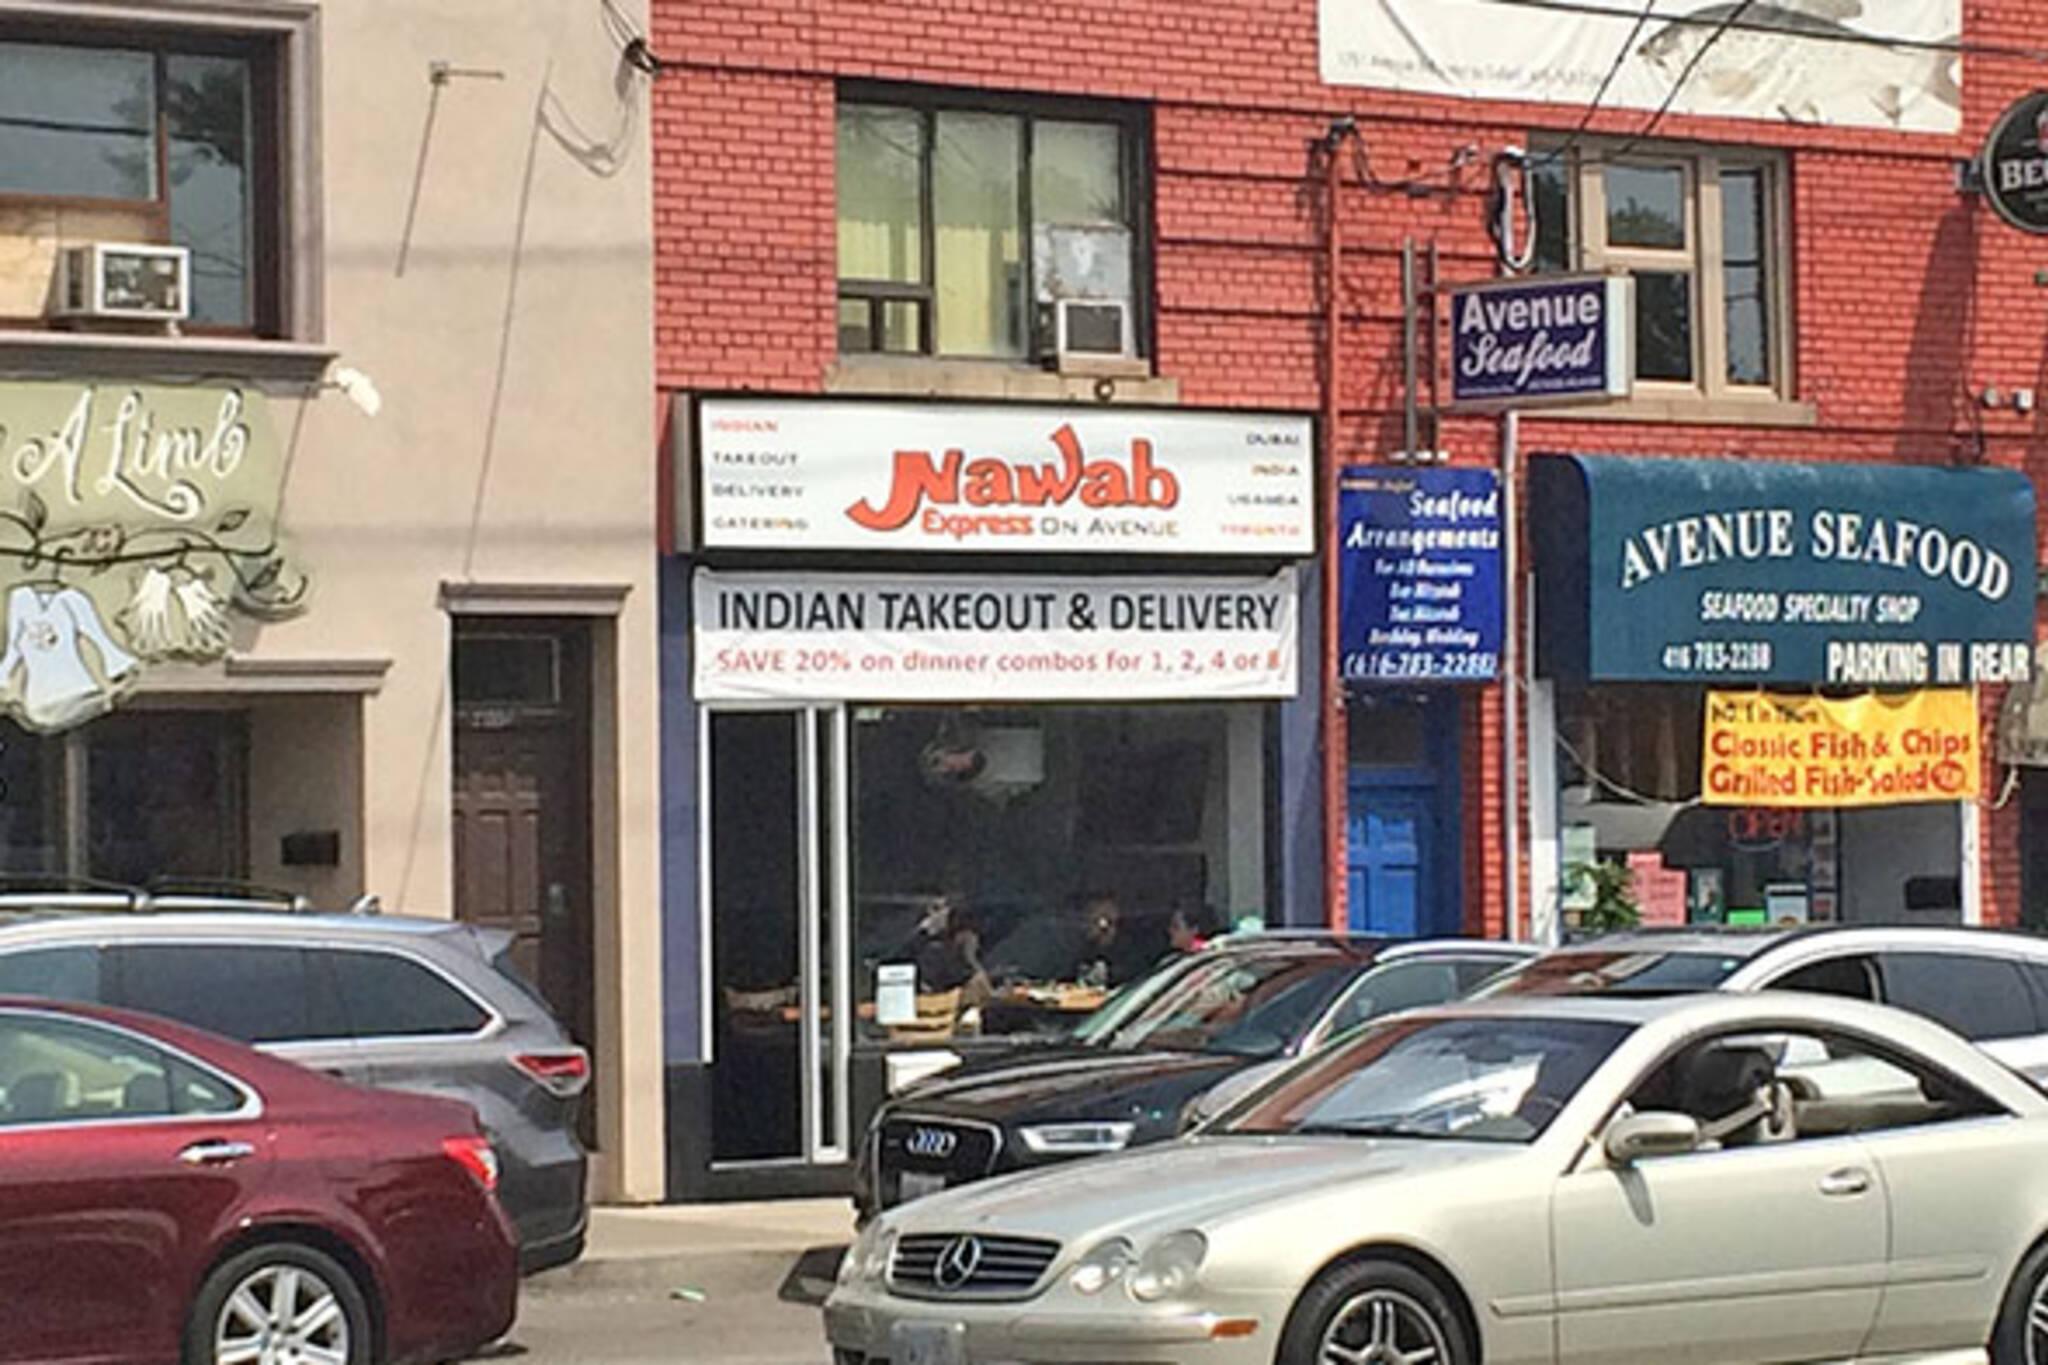 Nawab Express Avenue Toronto